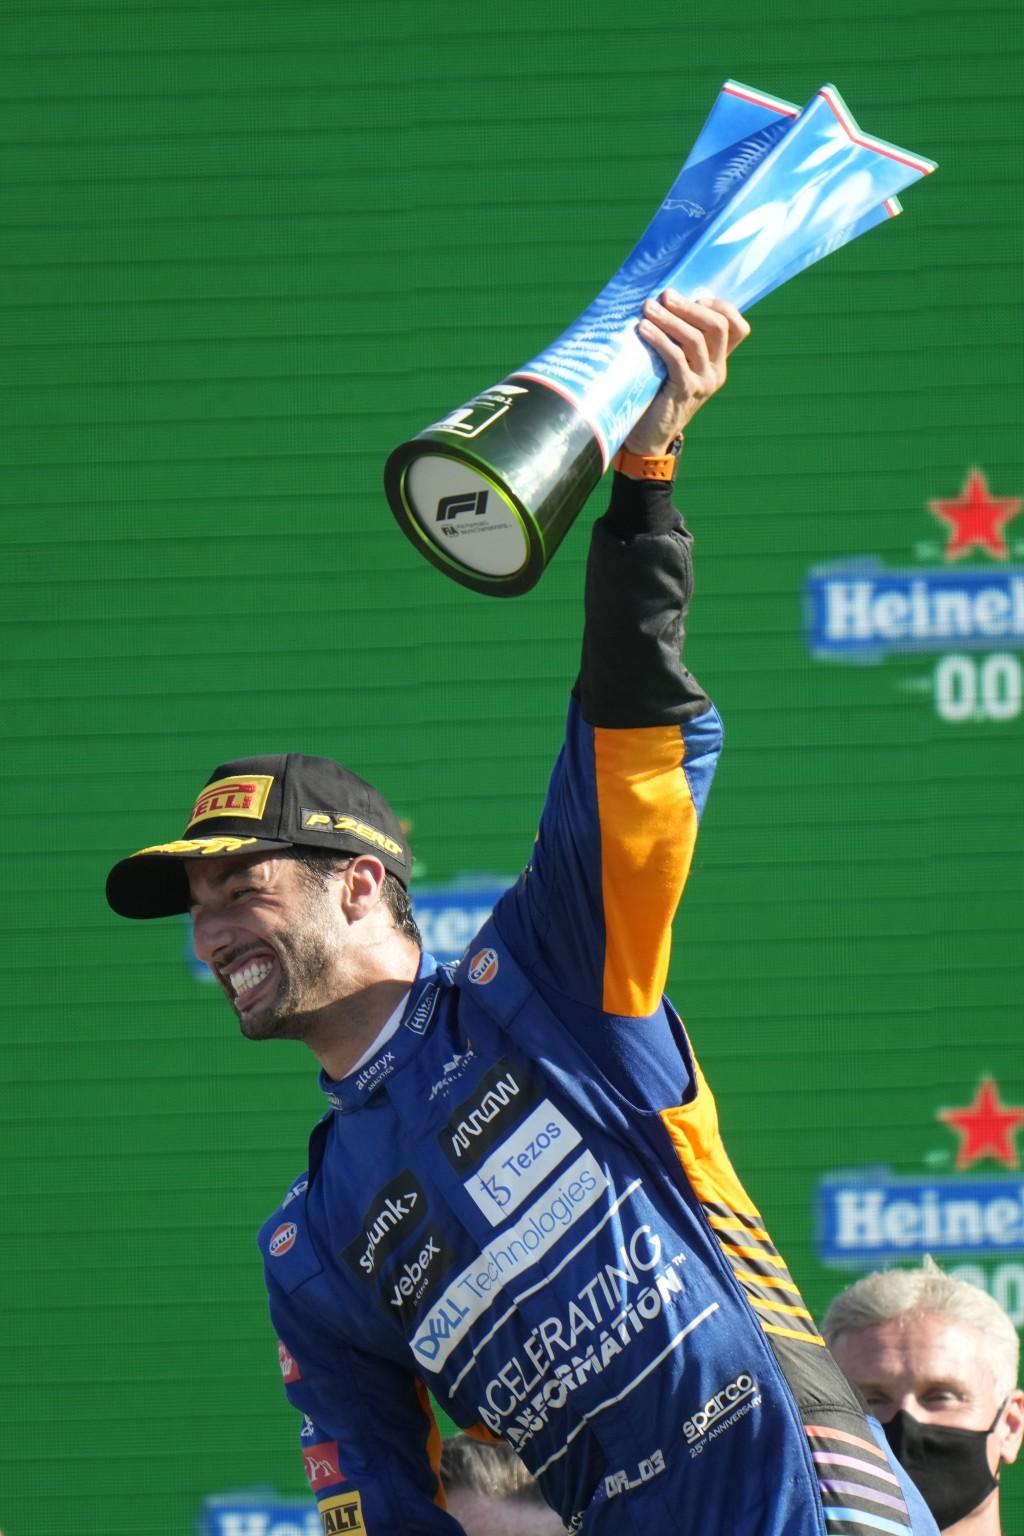 Mclaren driver Daniel Ricciardo of Australia celebrates after winning during the Italian Formula One Grand Prix, at Monza racetrack, in Monza, Italy, ...